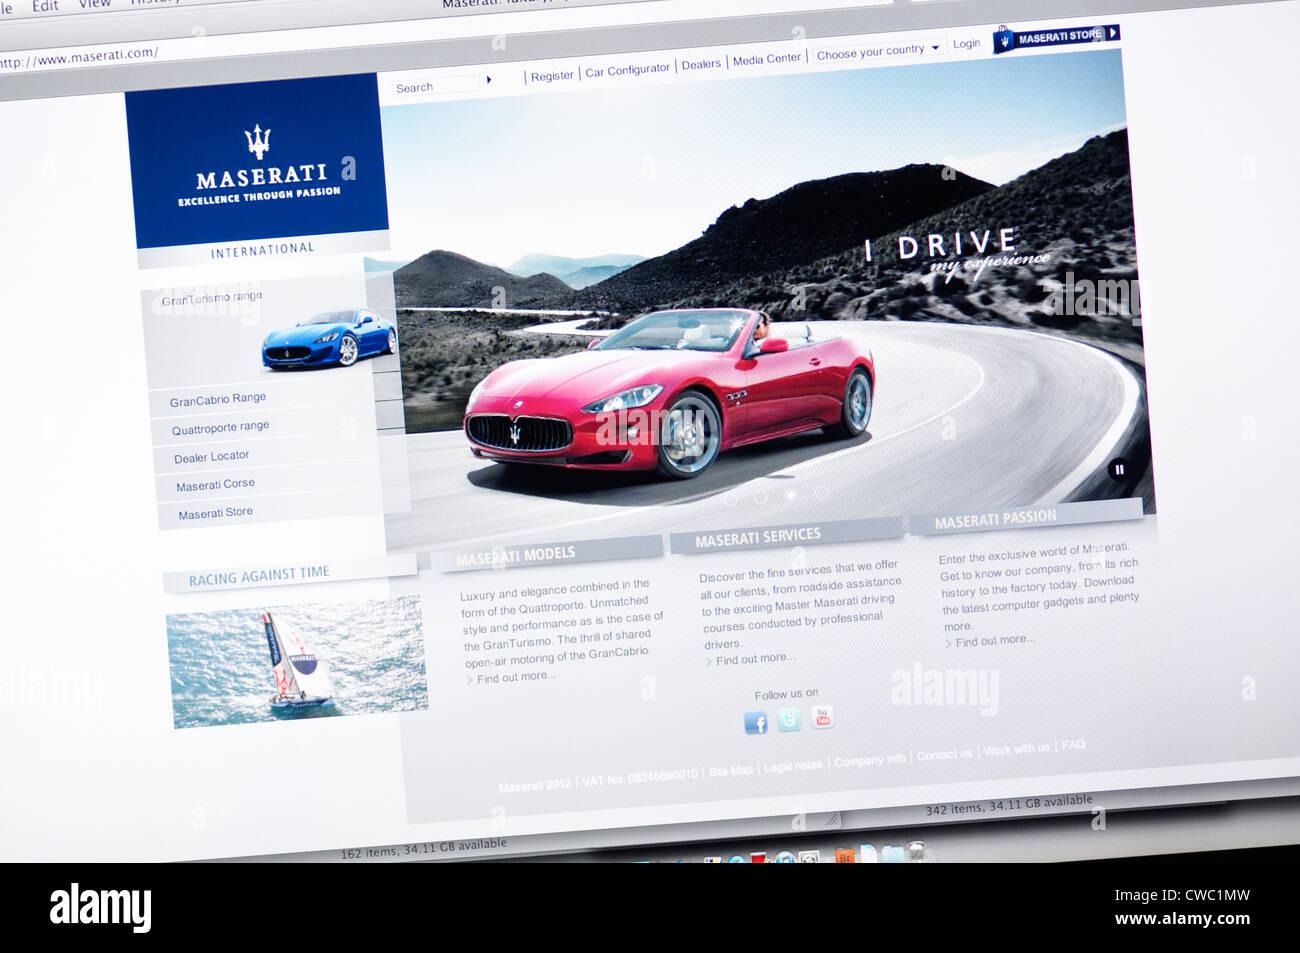 Maserati Website Sports Car Manufacturer Stock Photo Royalty - Maserati roadside assistance